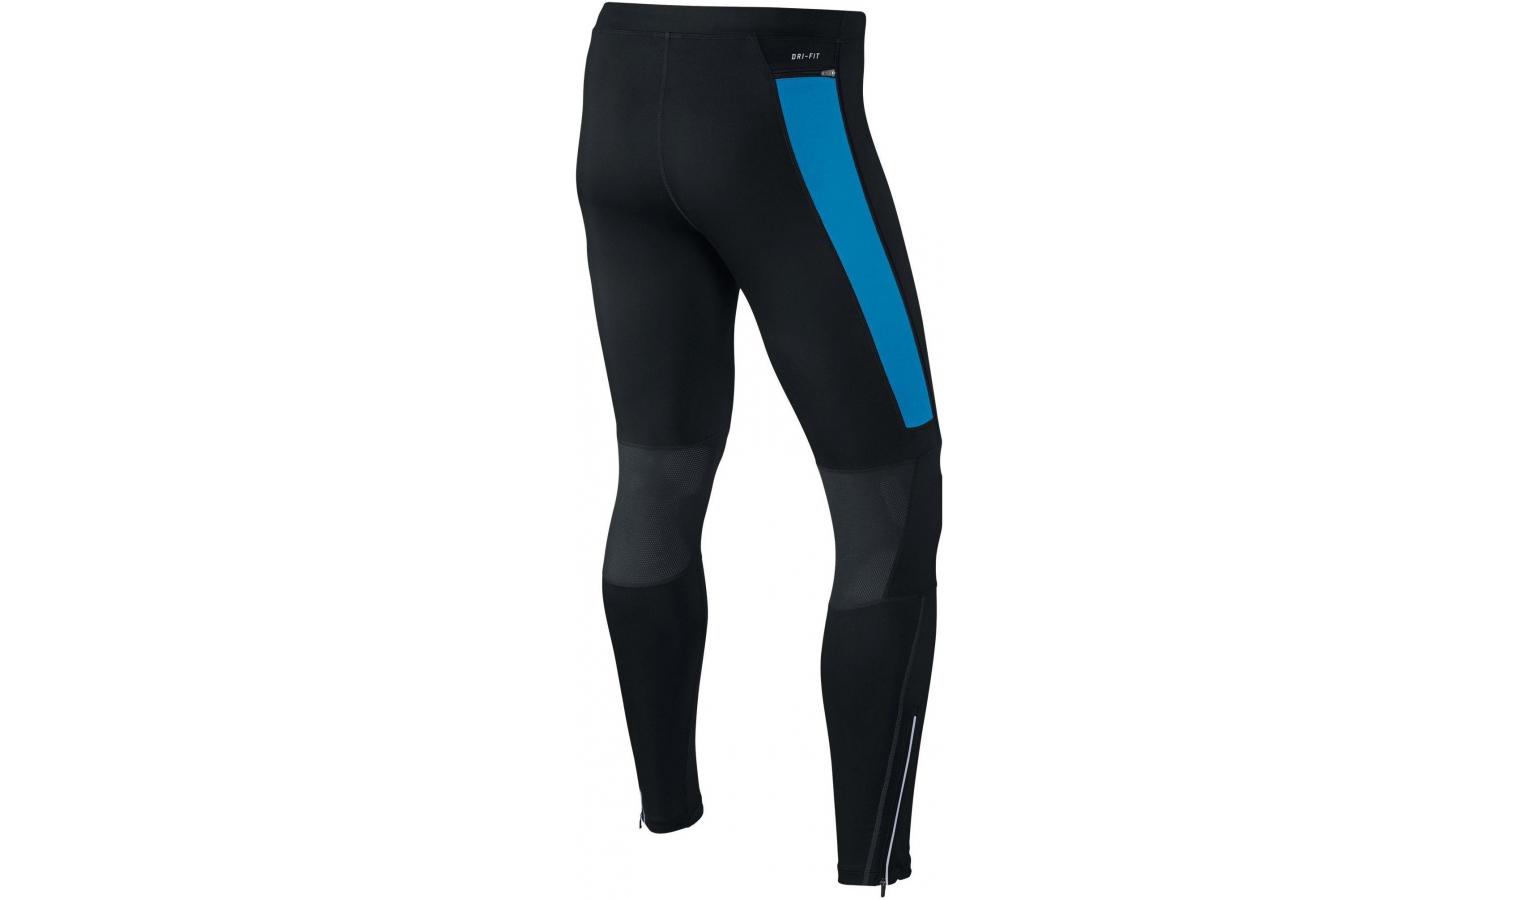 0eb10d2aea3b Pánske bežecké nohavice Nike DRI-FIT ESSENTIAL čierne